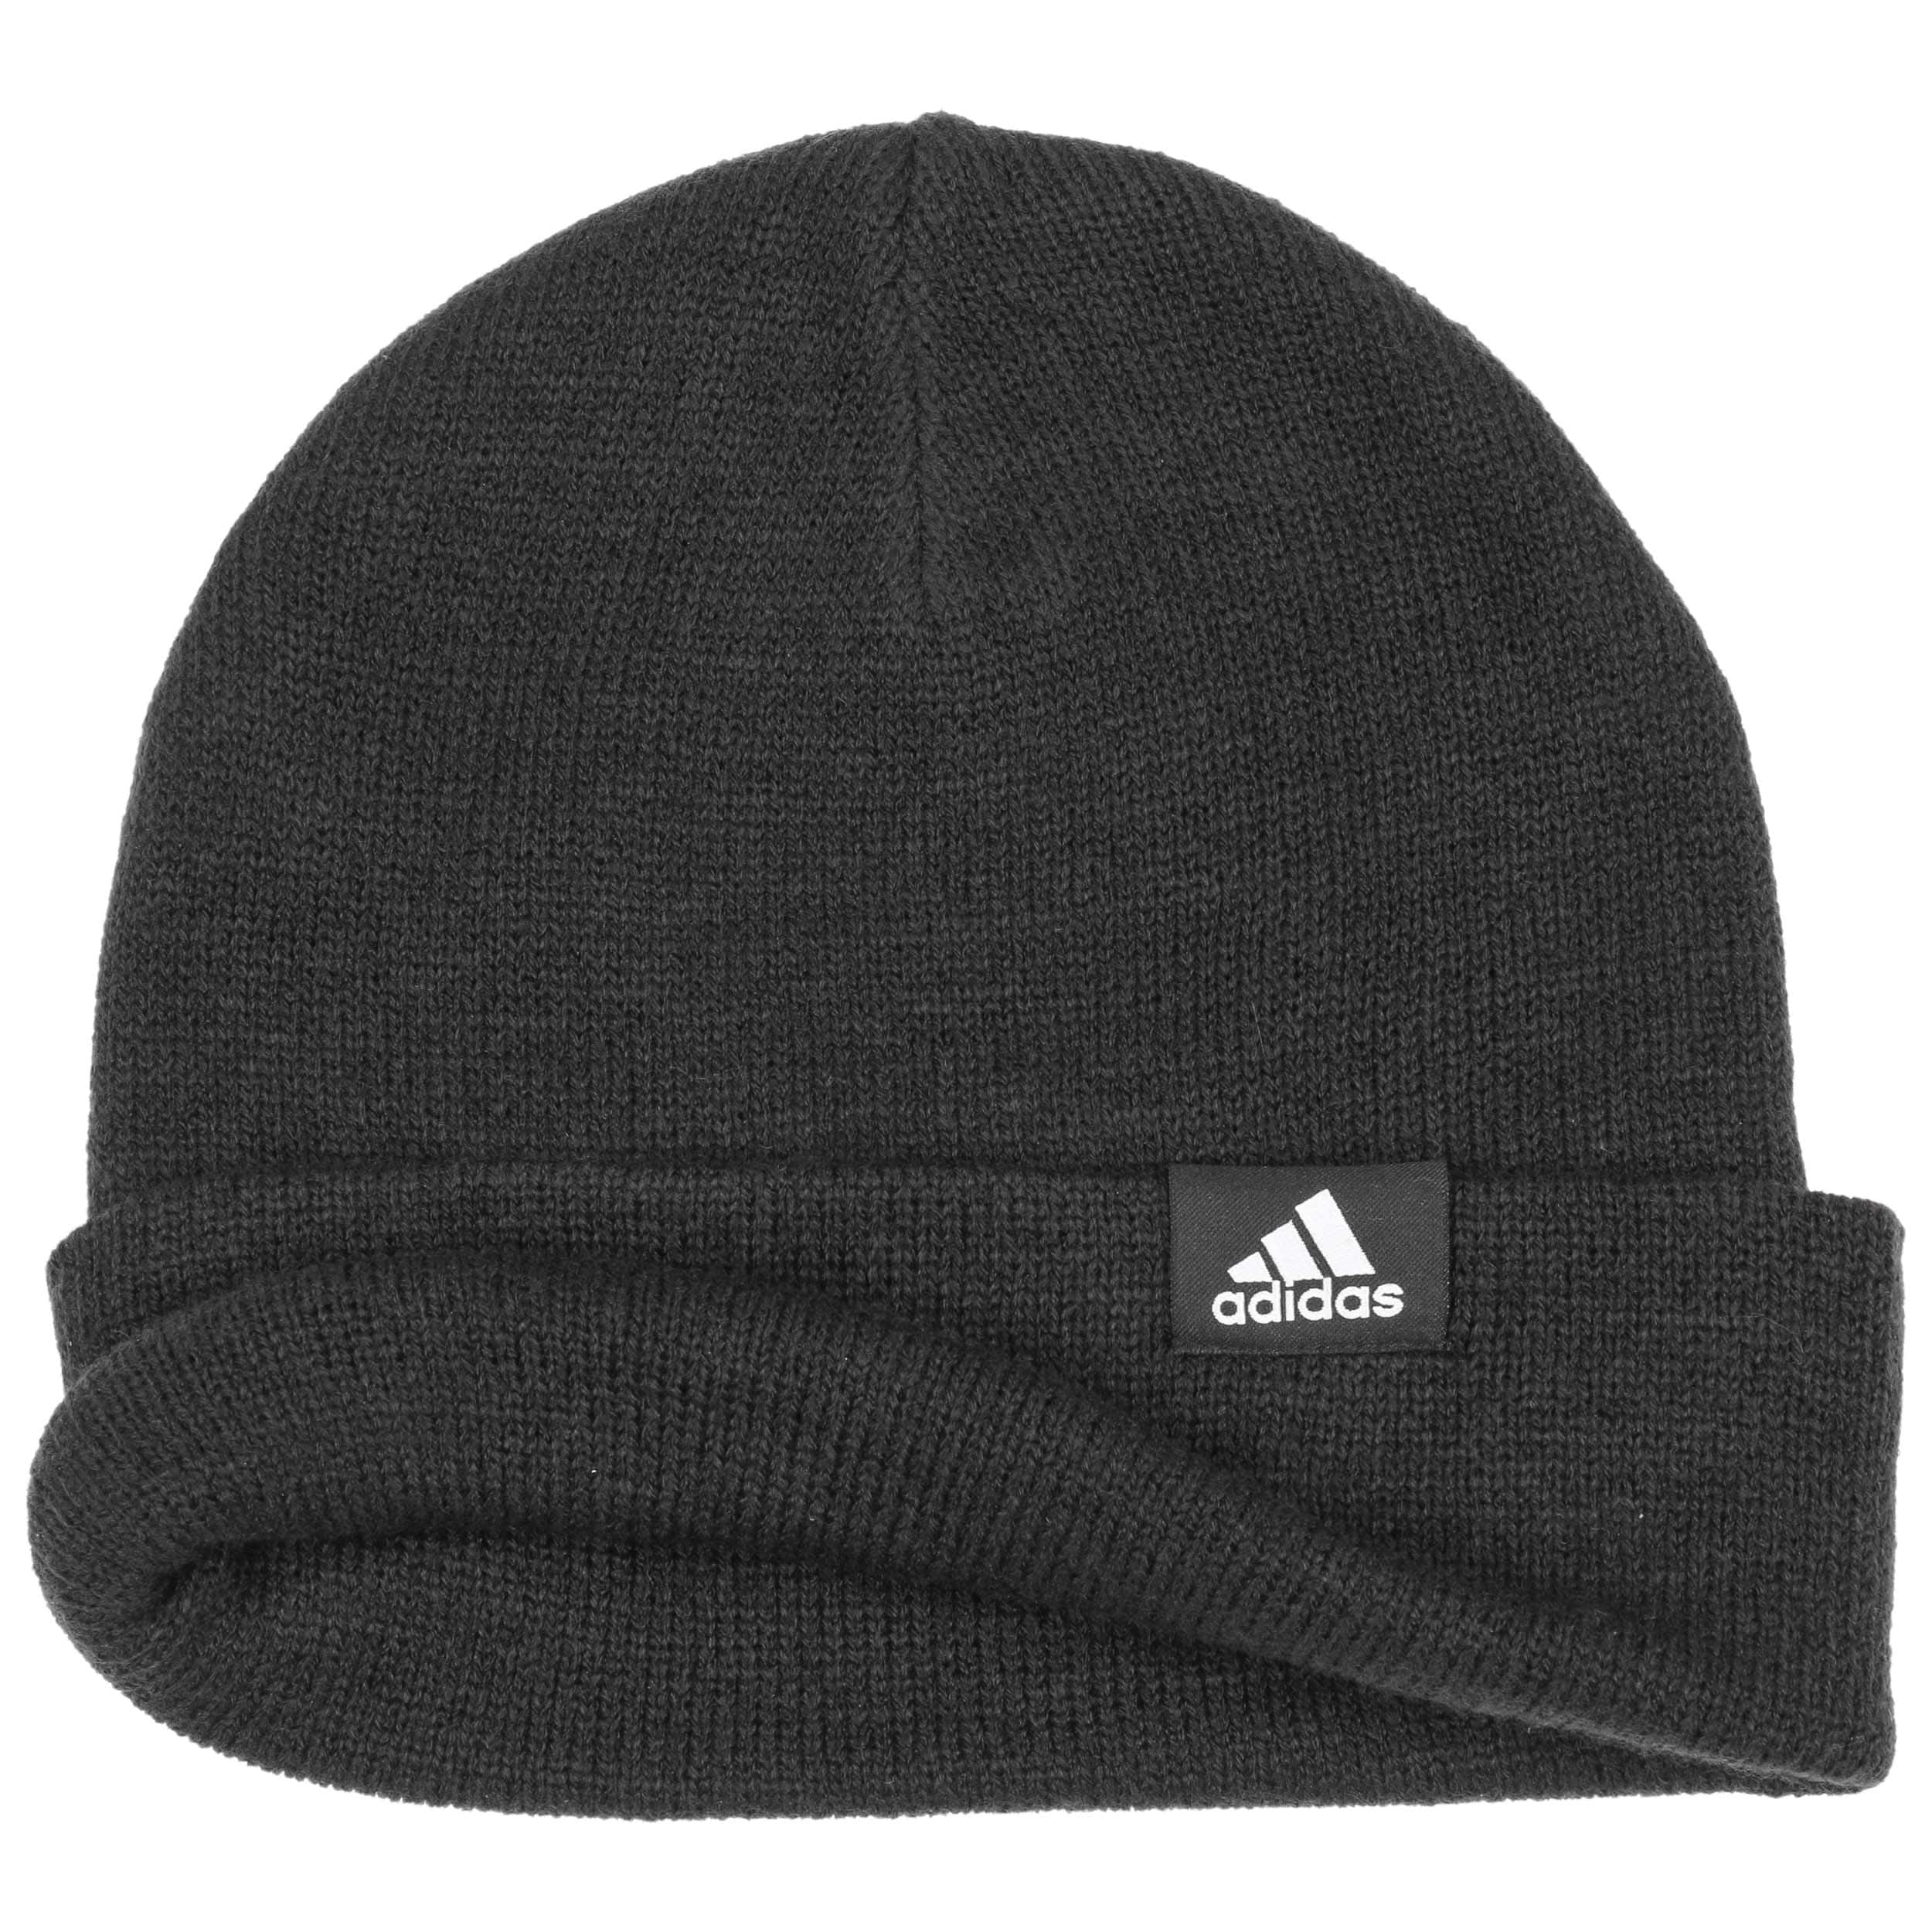 cappello nero adidas invernale